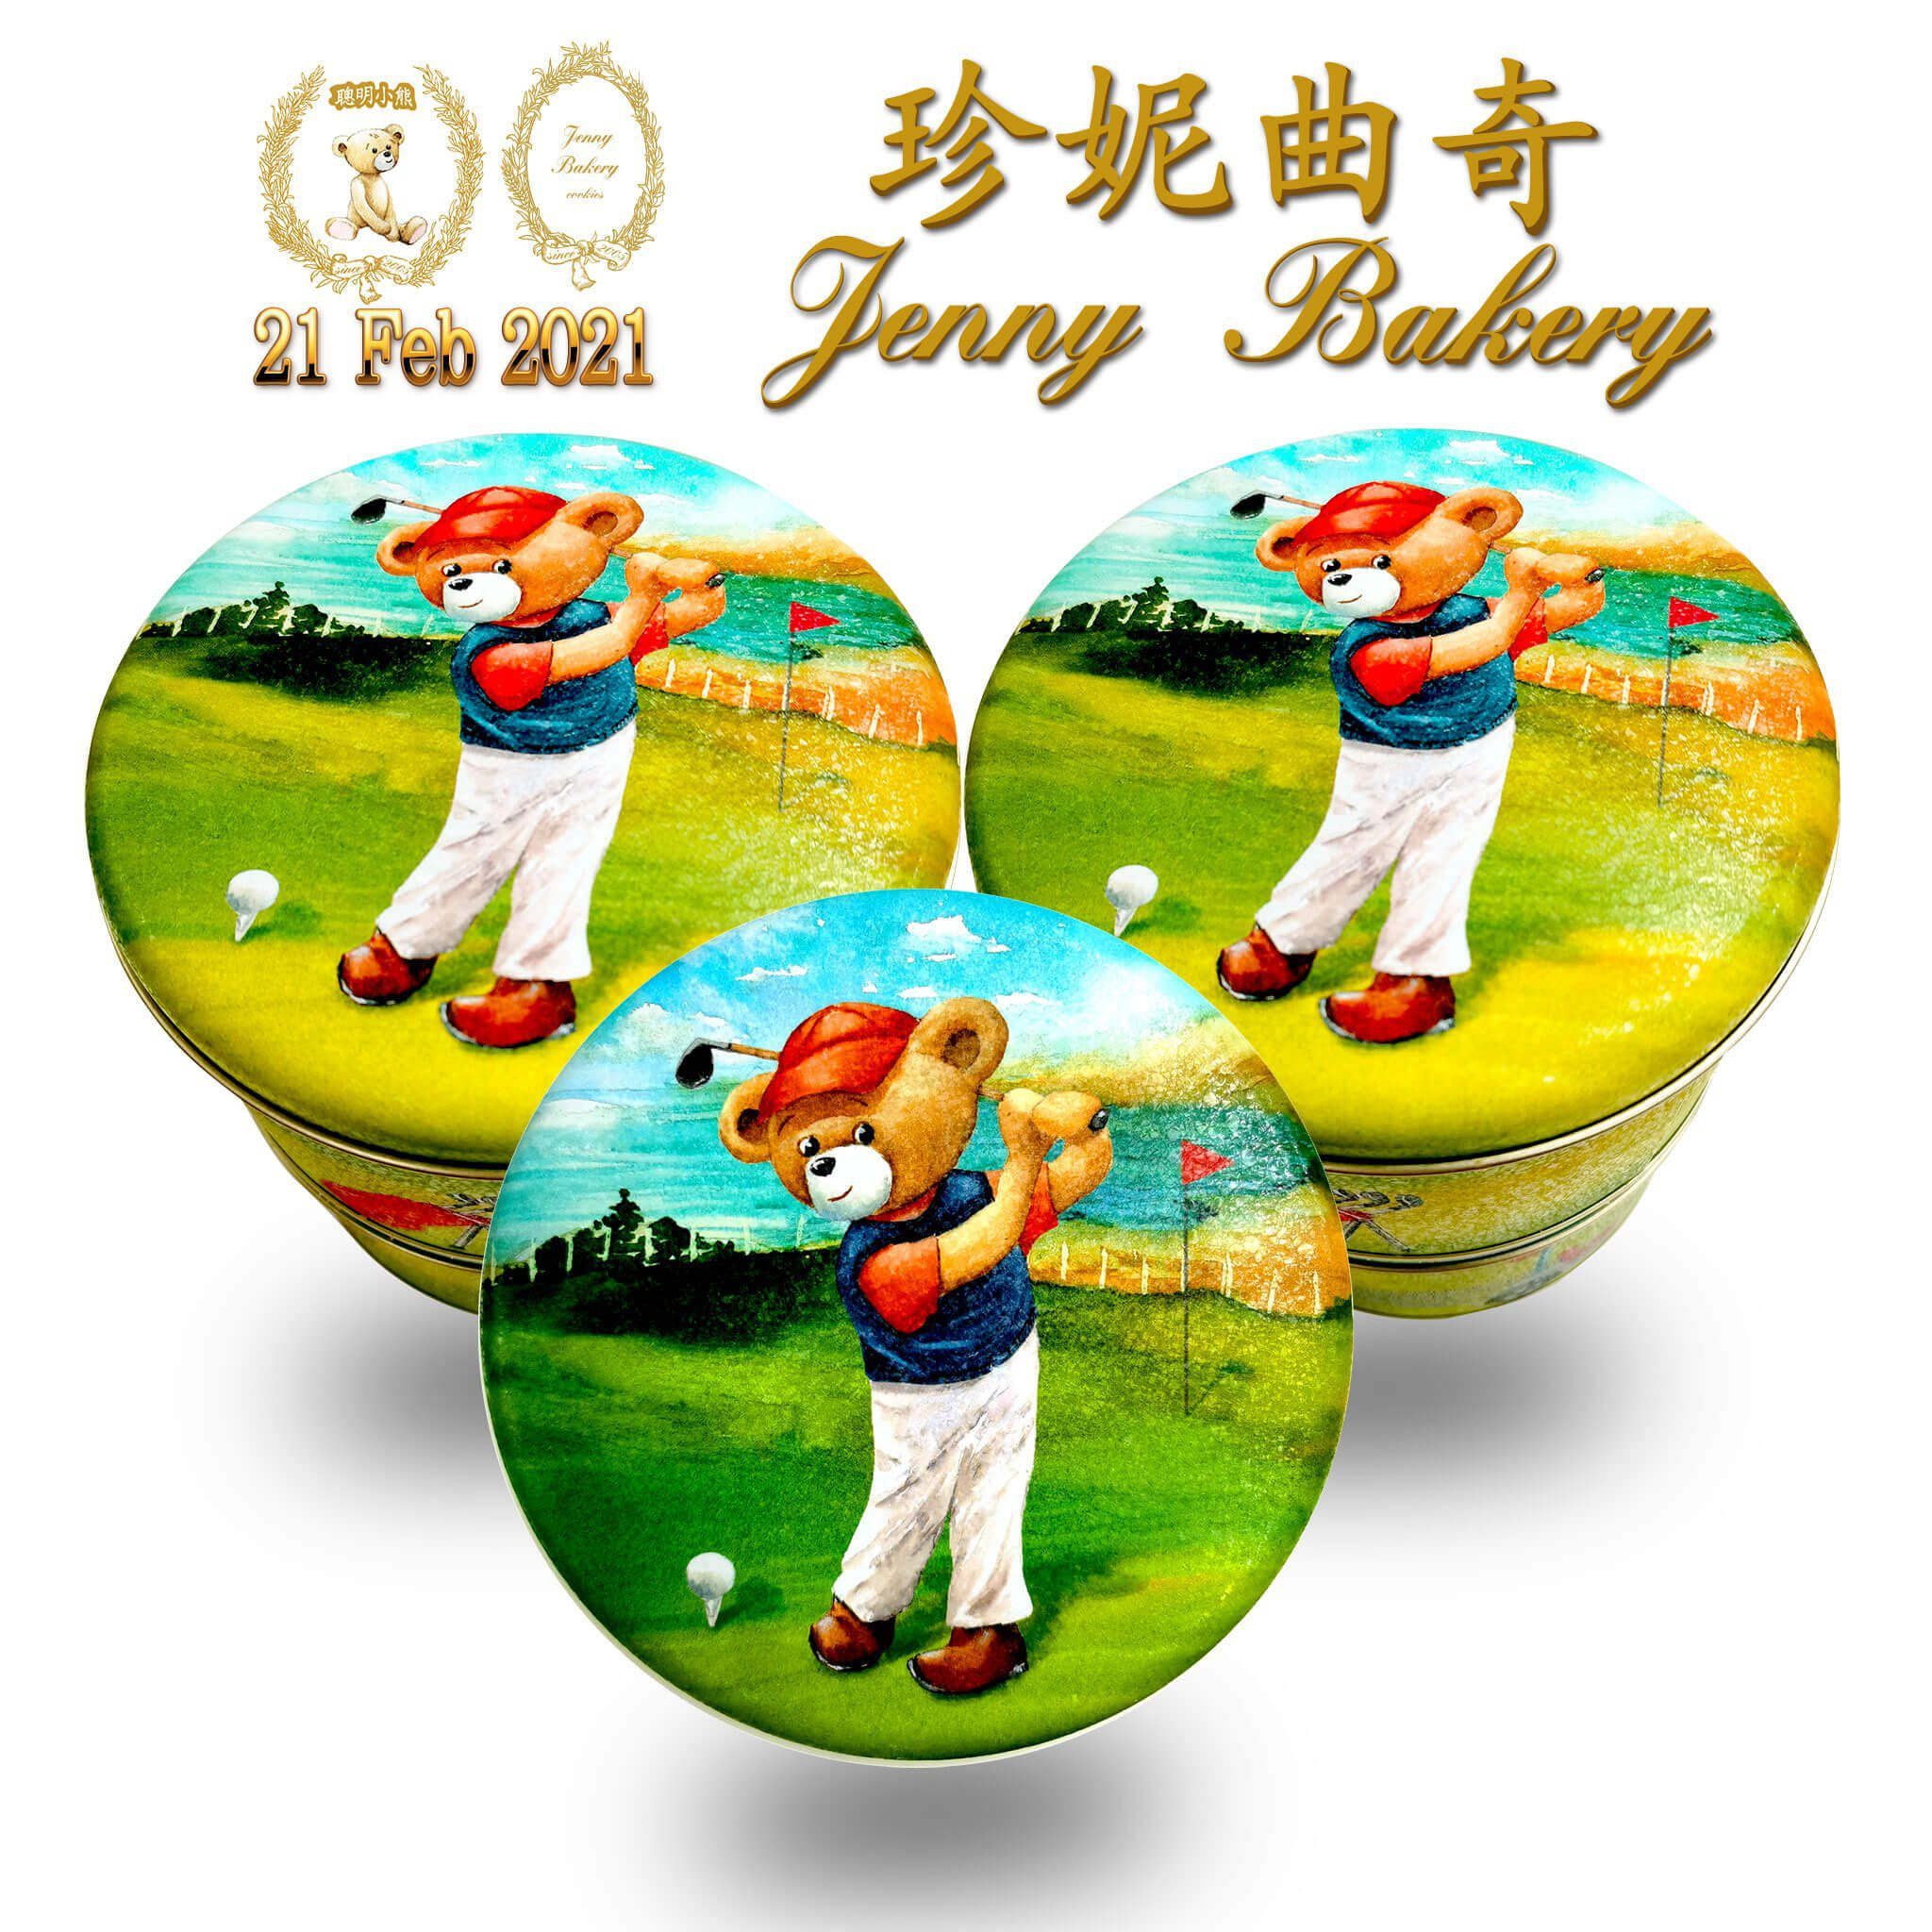 Golfing | Design20210221 Golf